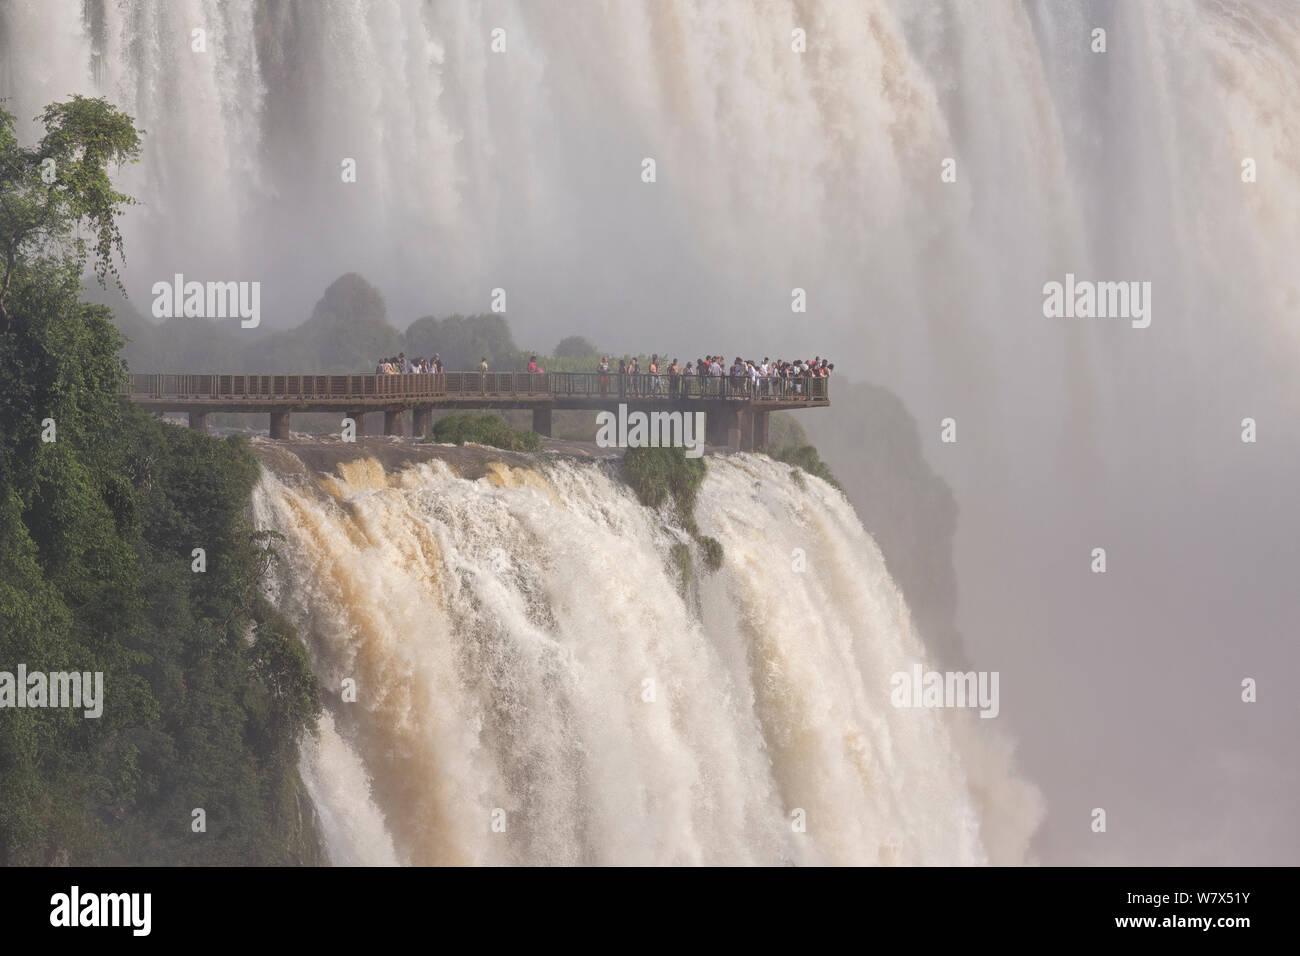 Iguazu Waterfalls and tourists on viewing platform, Iguazu Falls, Iguazu National Park, Brazil, January 2014. Stock Photo